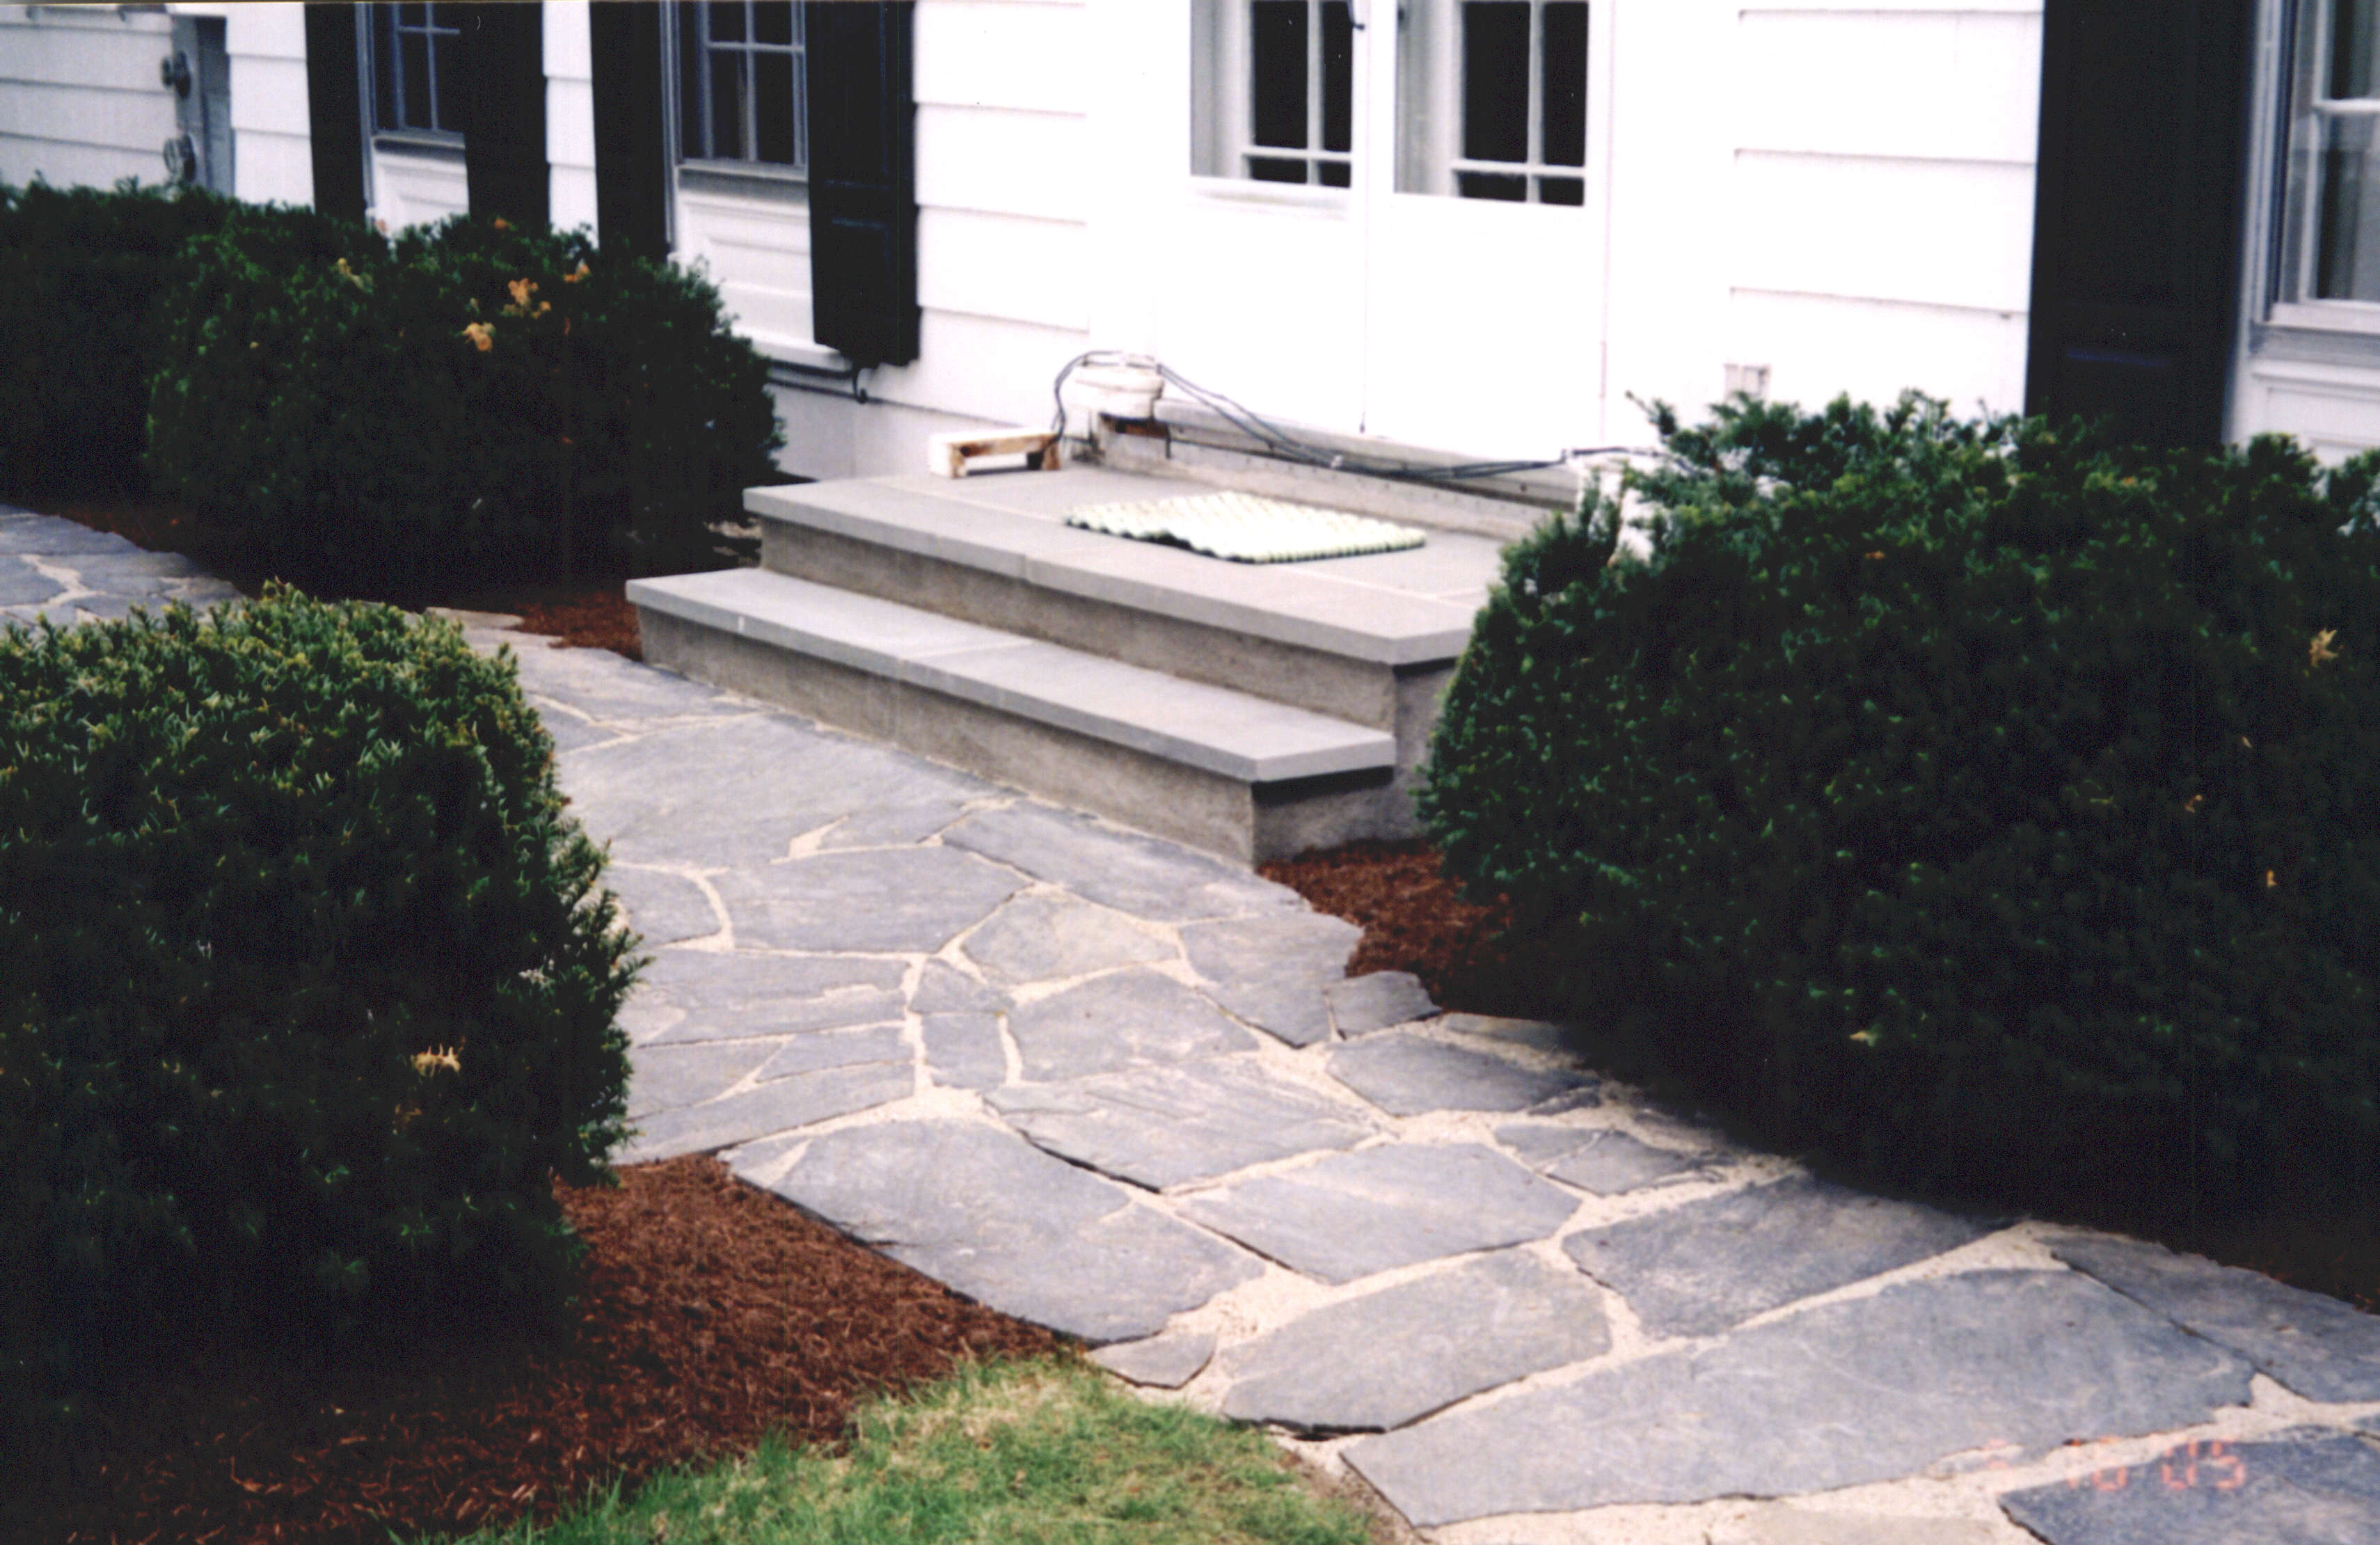 JTs Landscaping & Lawncare LLC